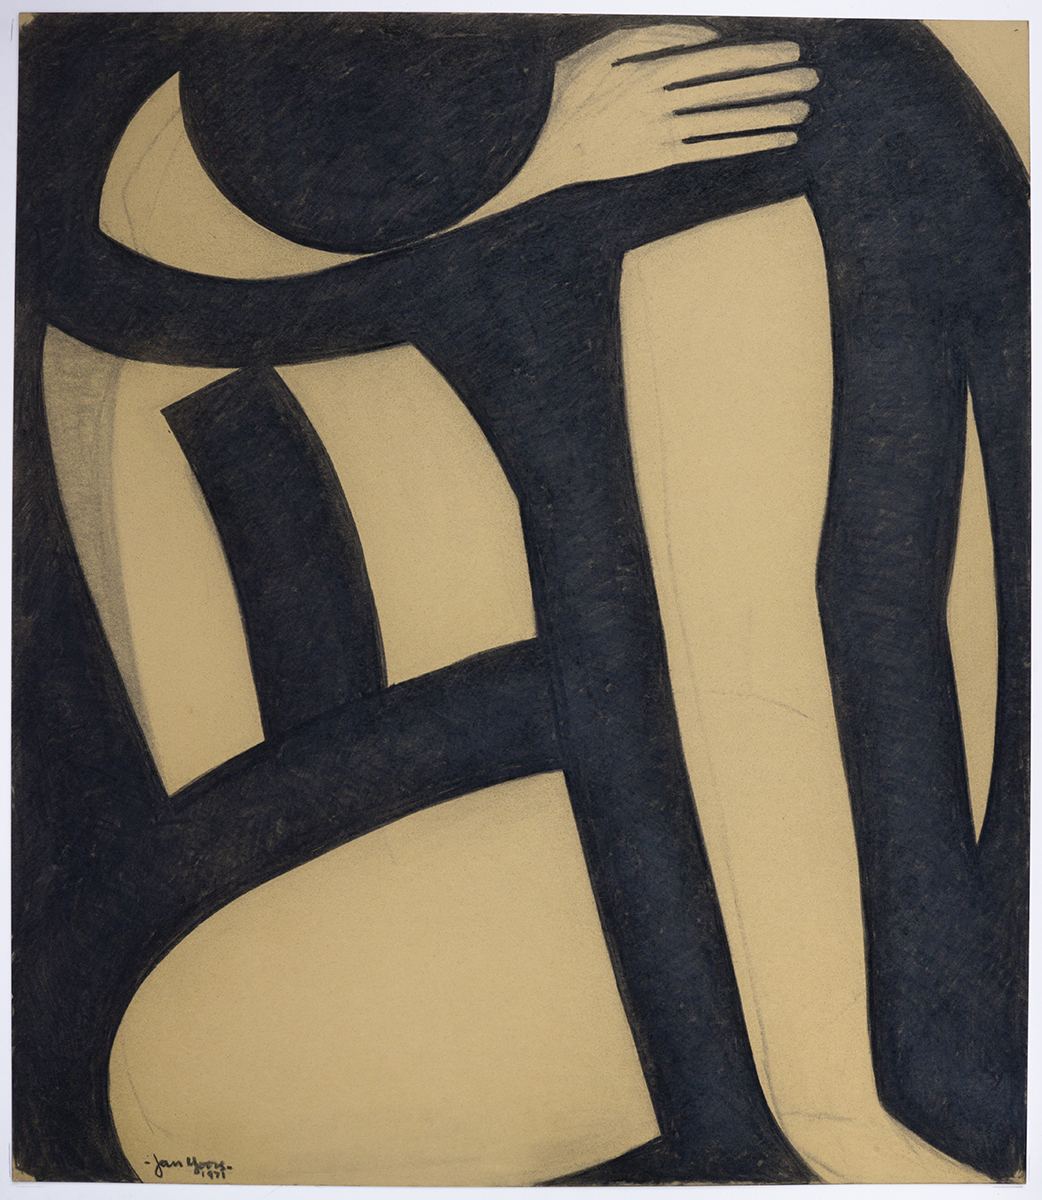 Nude (G-17.10), 1971